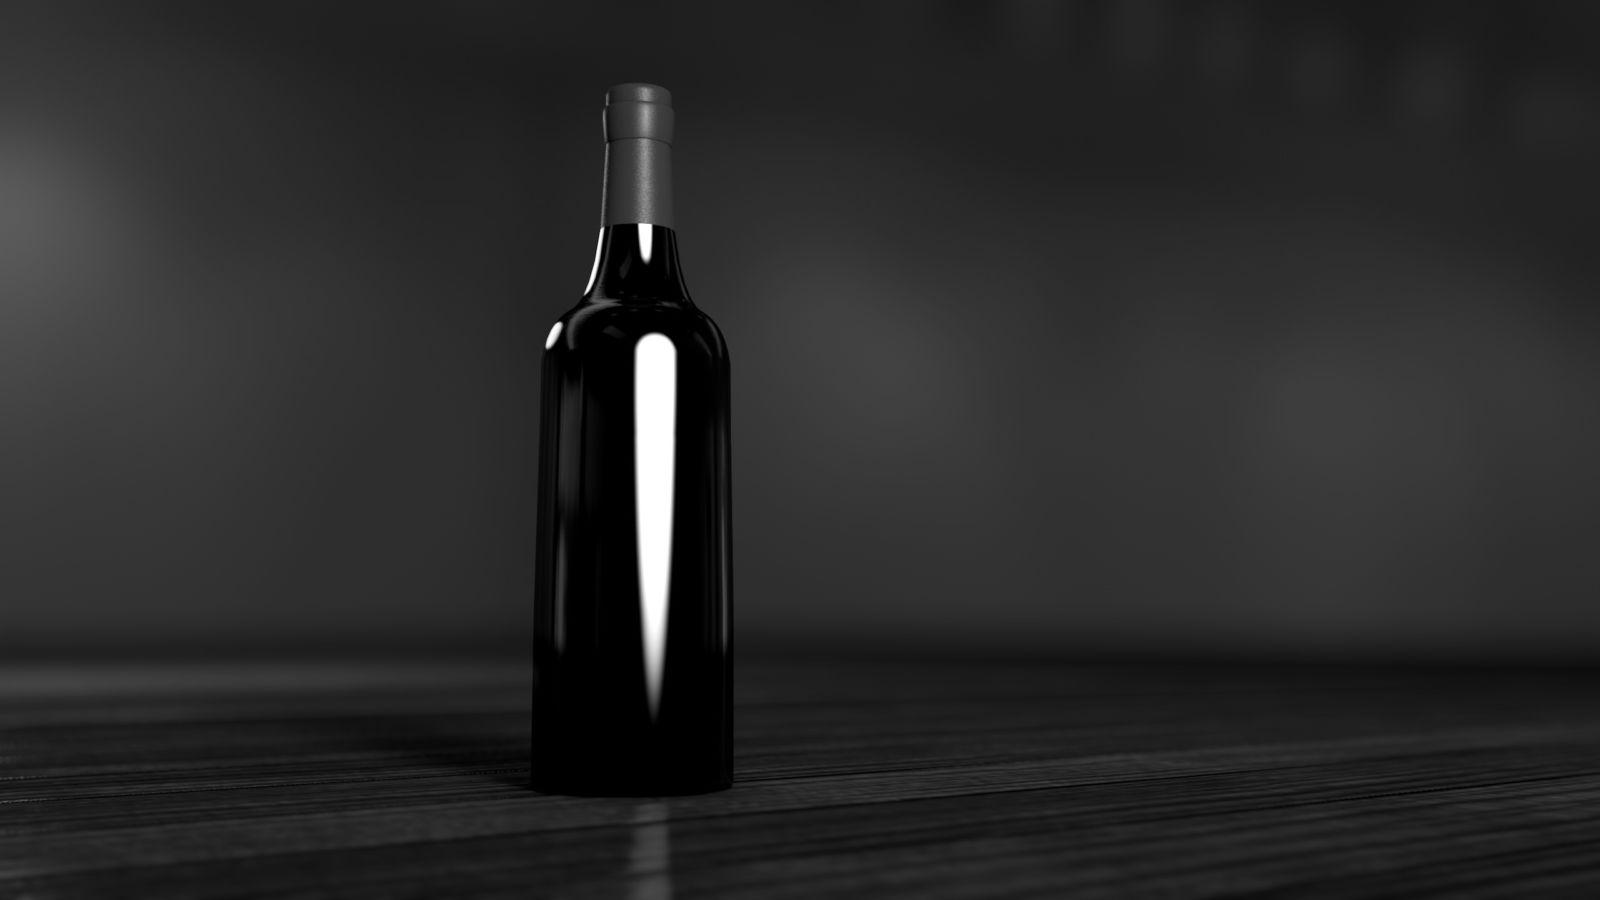 bottle-691599